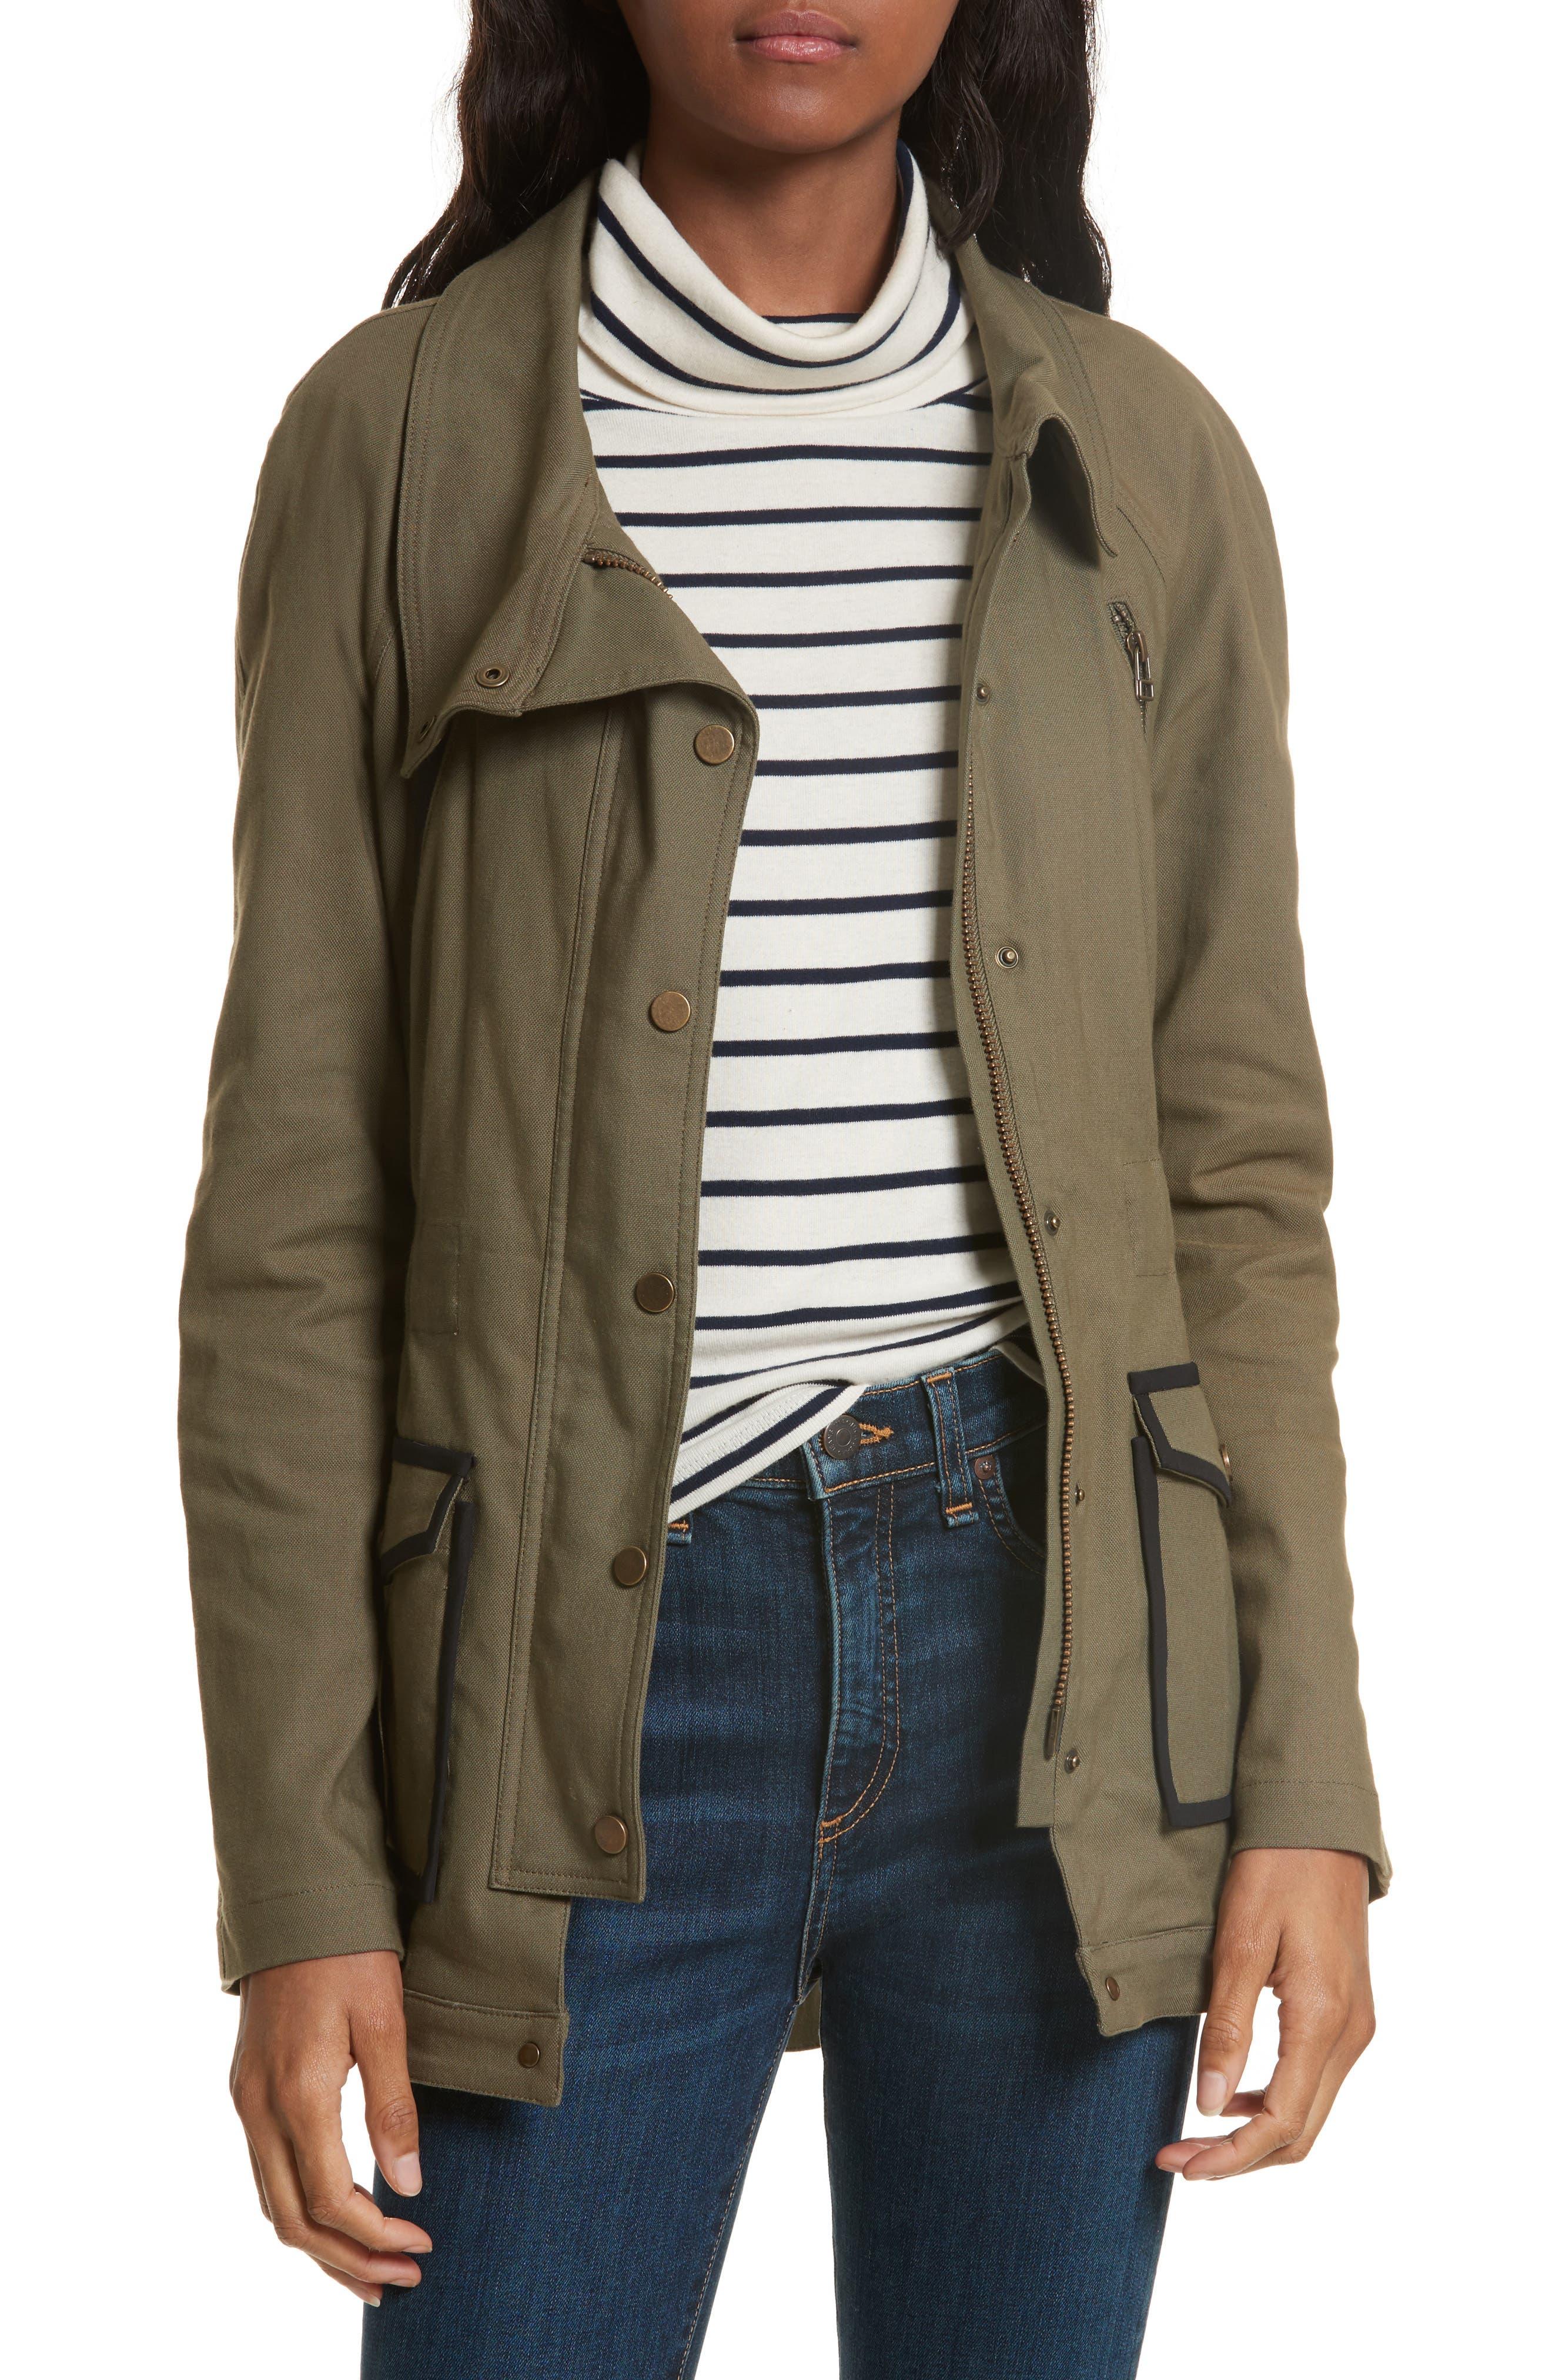 Main Image - Veronica Beard Army Jacket